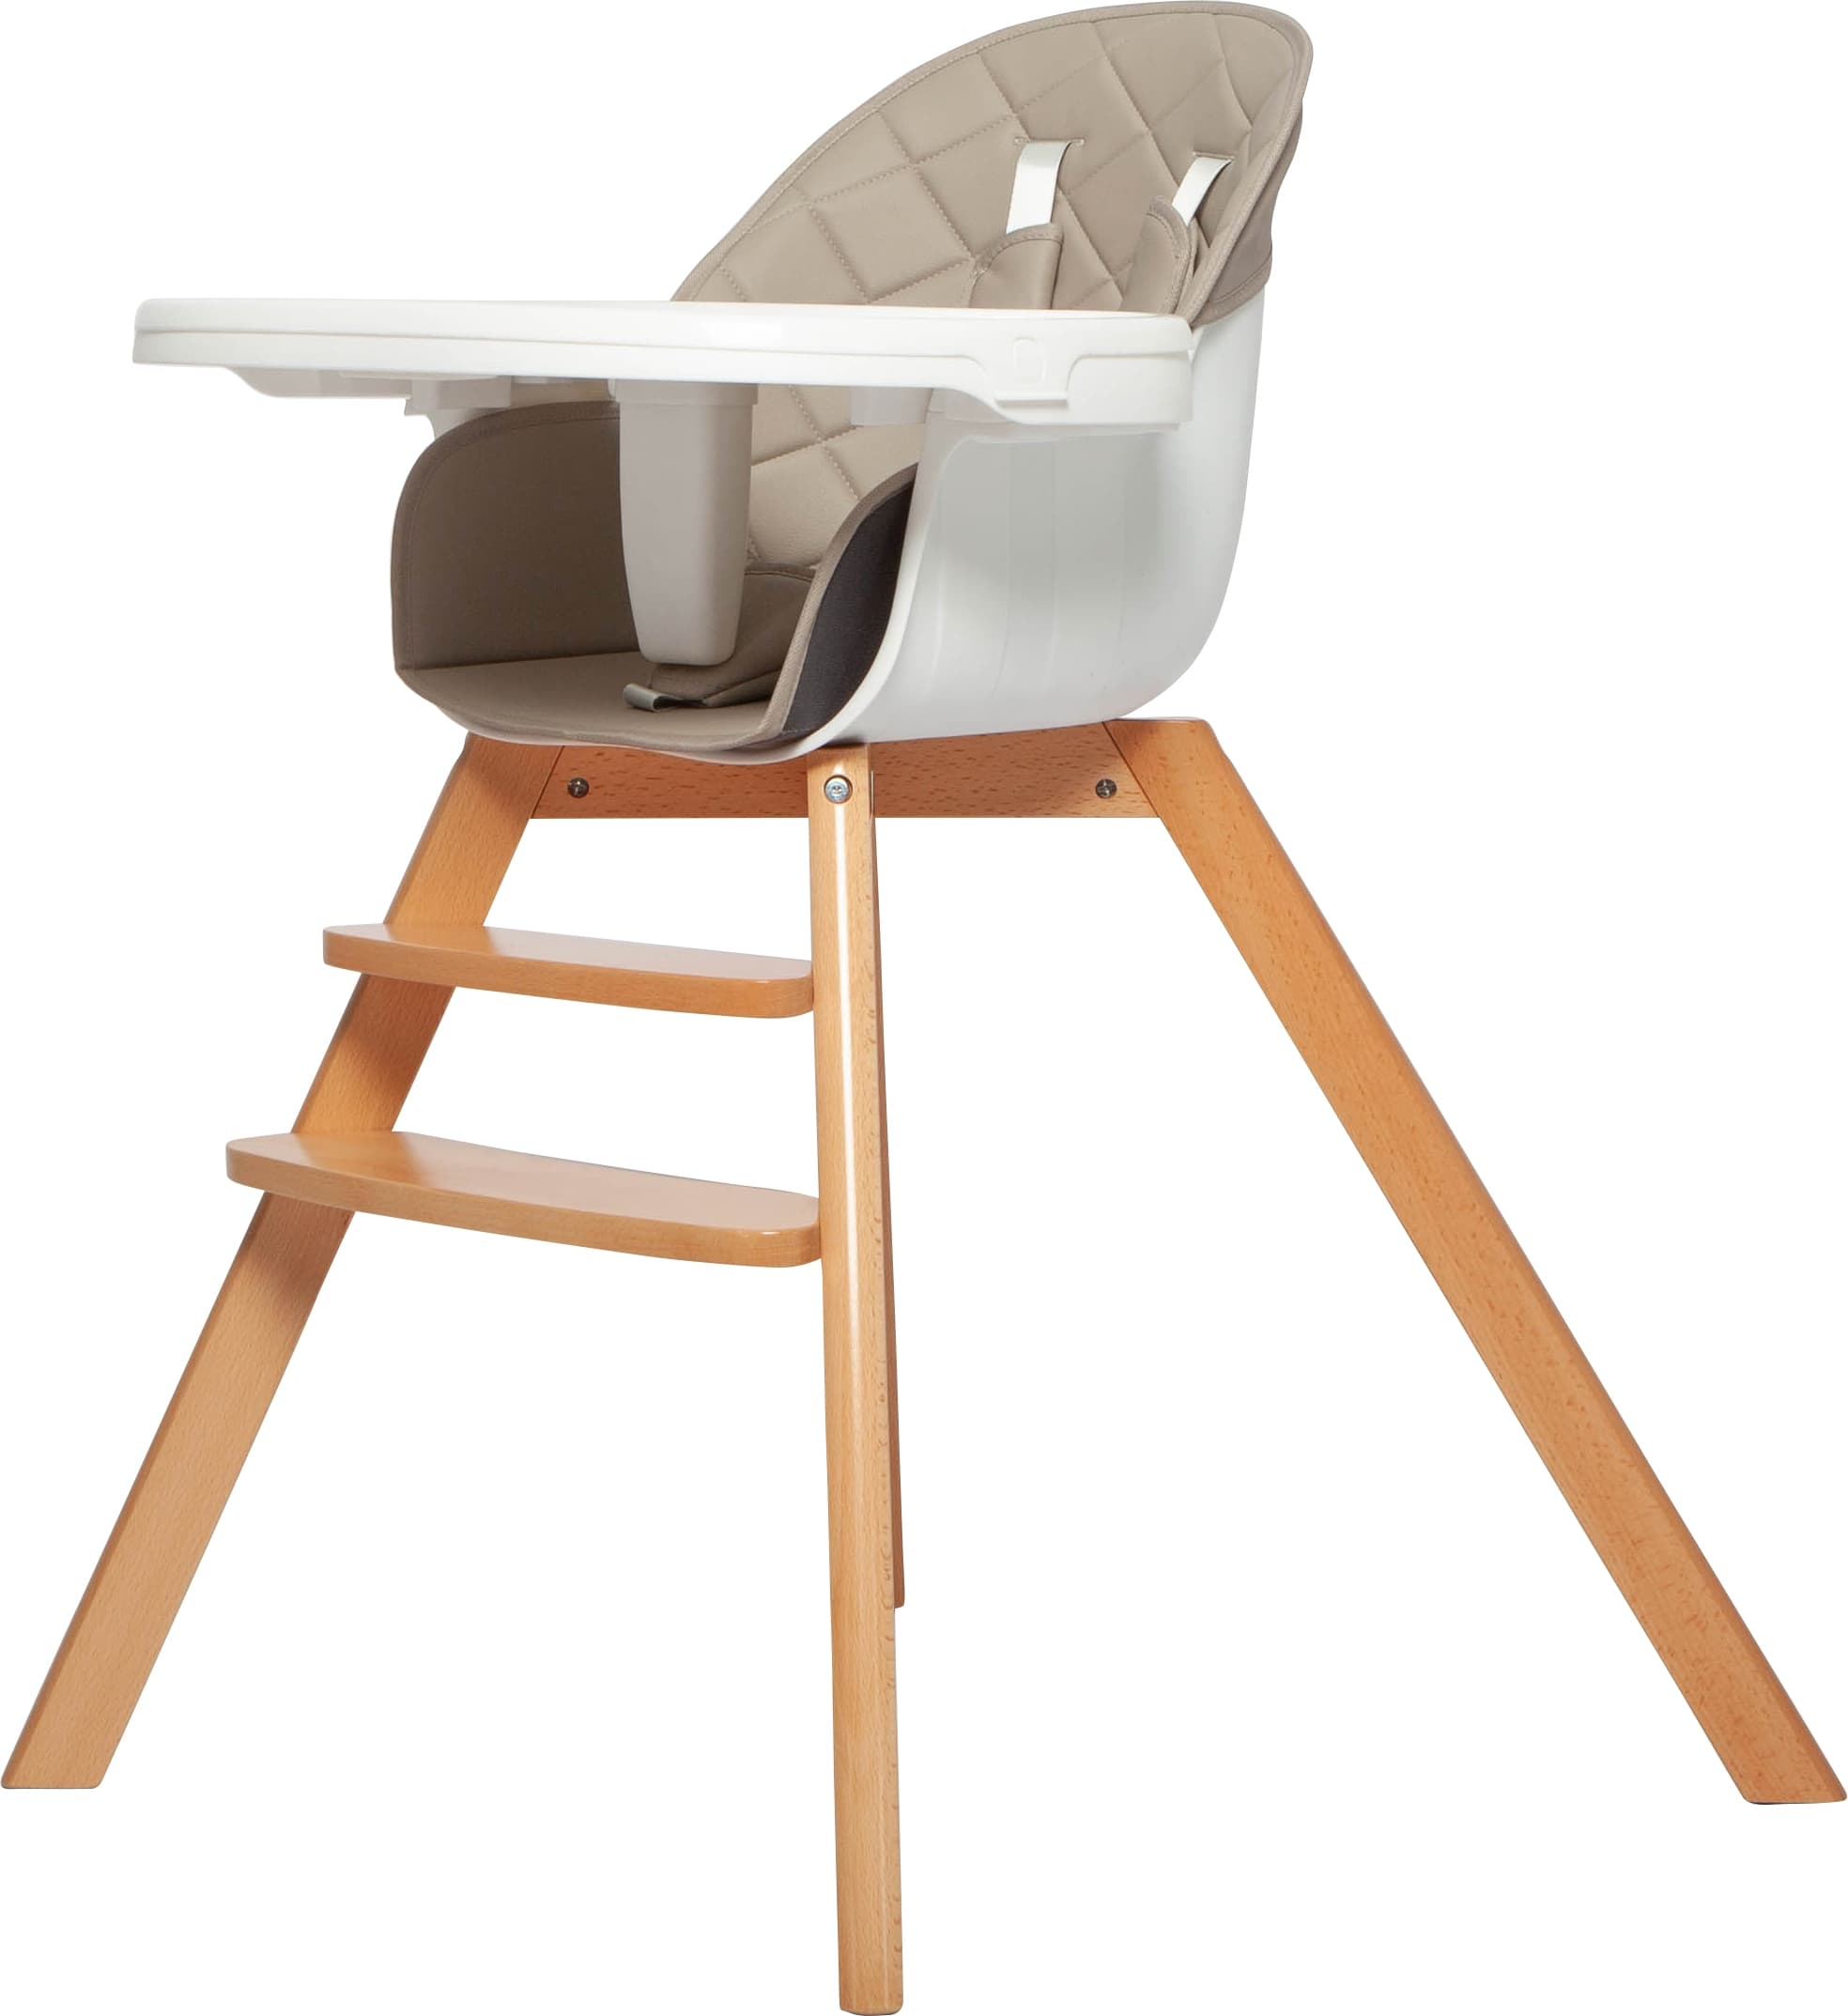 Grotime Birch High-Low Chair - Desert Grey